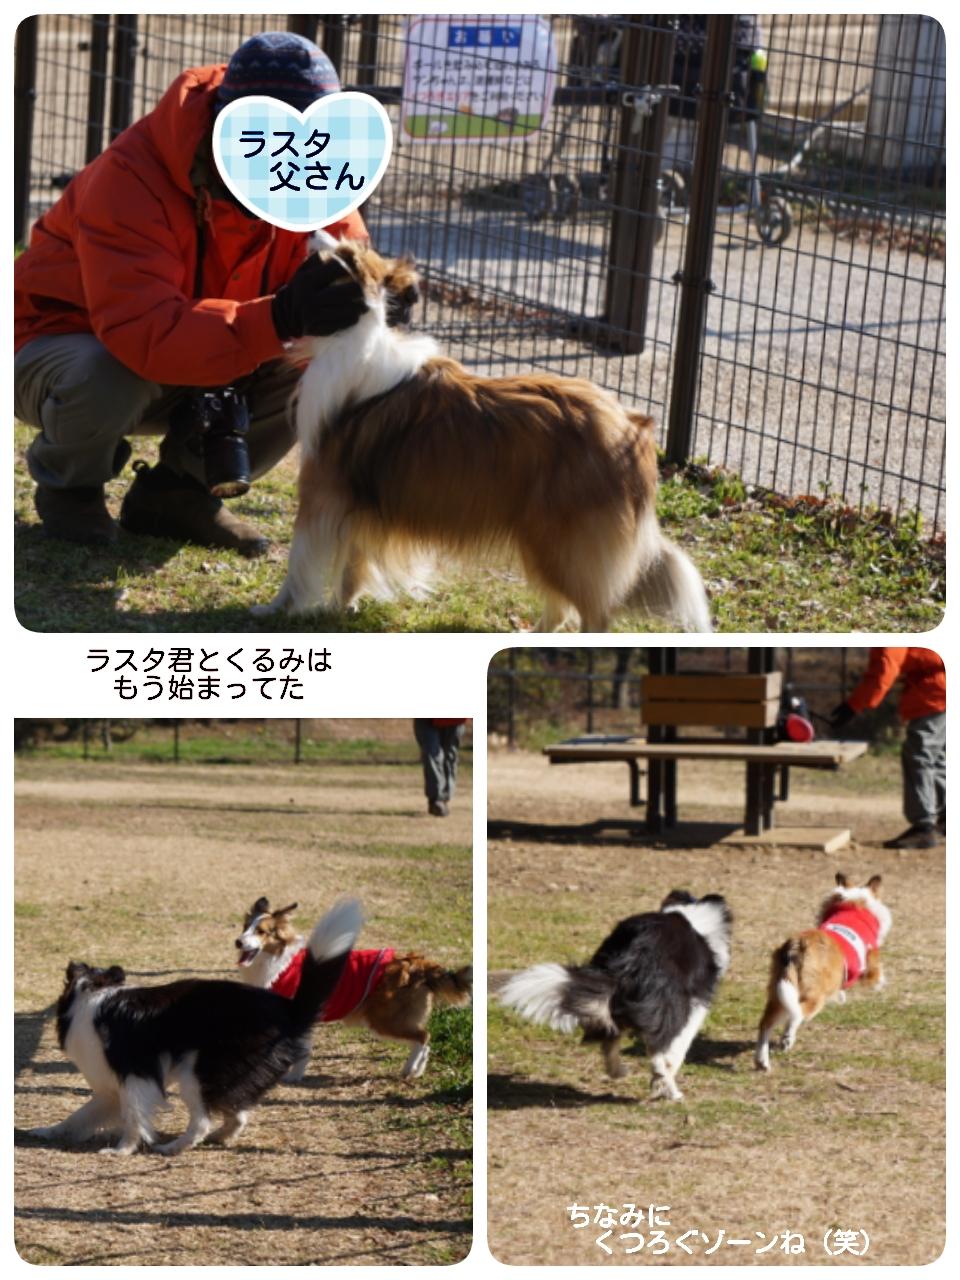 16-01-16-16-09-53-668_deco.jpg